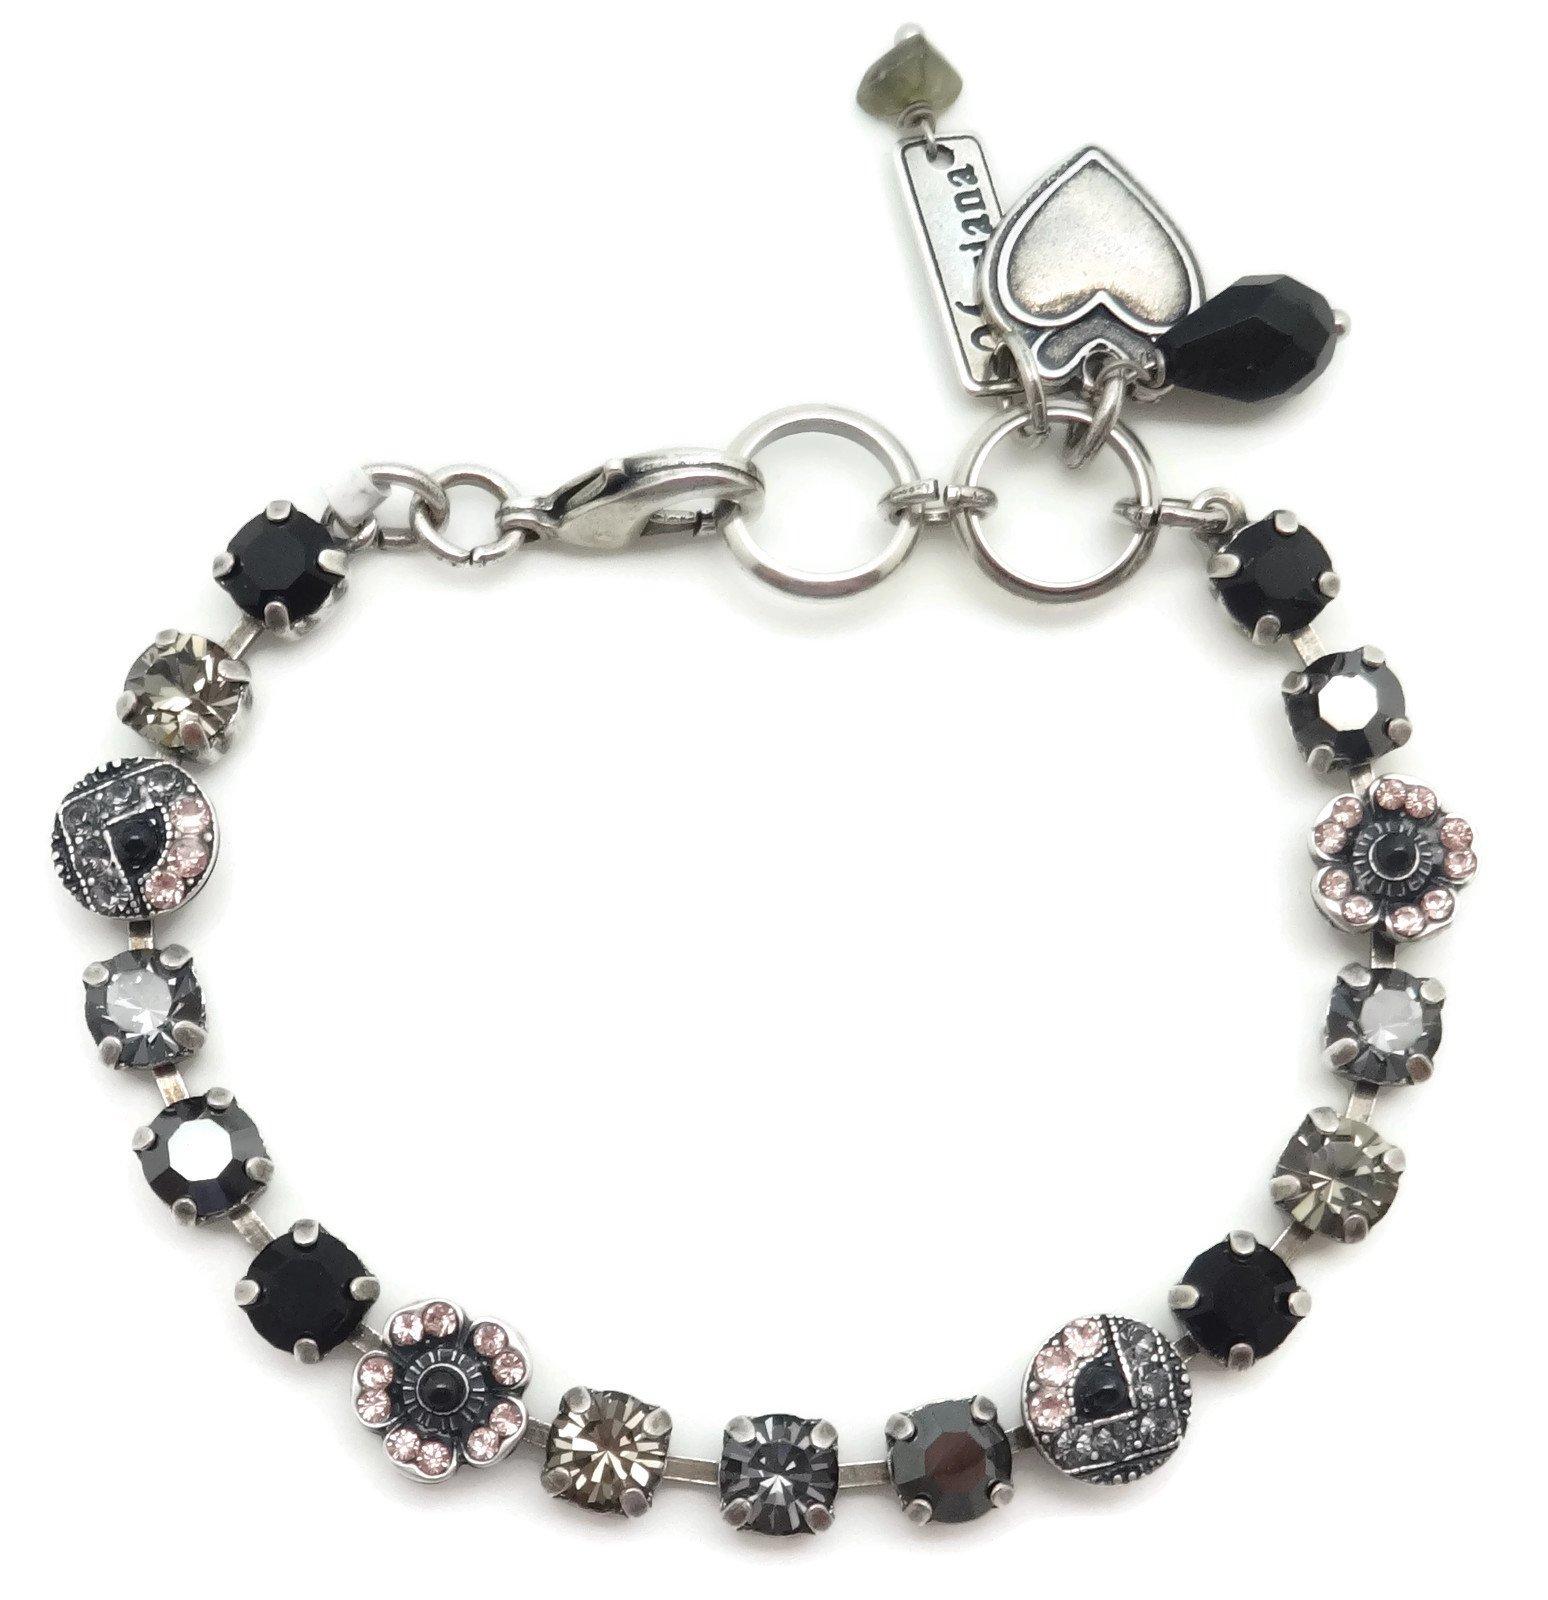 Mariana Swarovski Crystal Silver Plated Bracelet Petite Pink Grey Black Mosaic 1073 Black Velvet